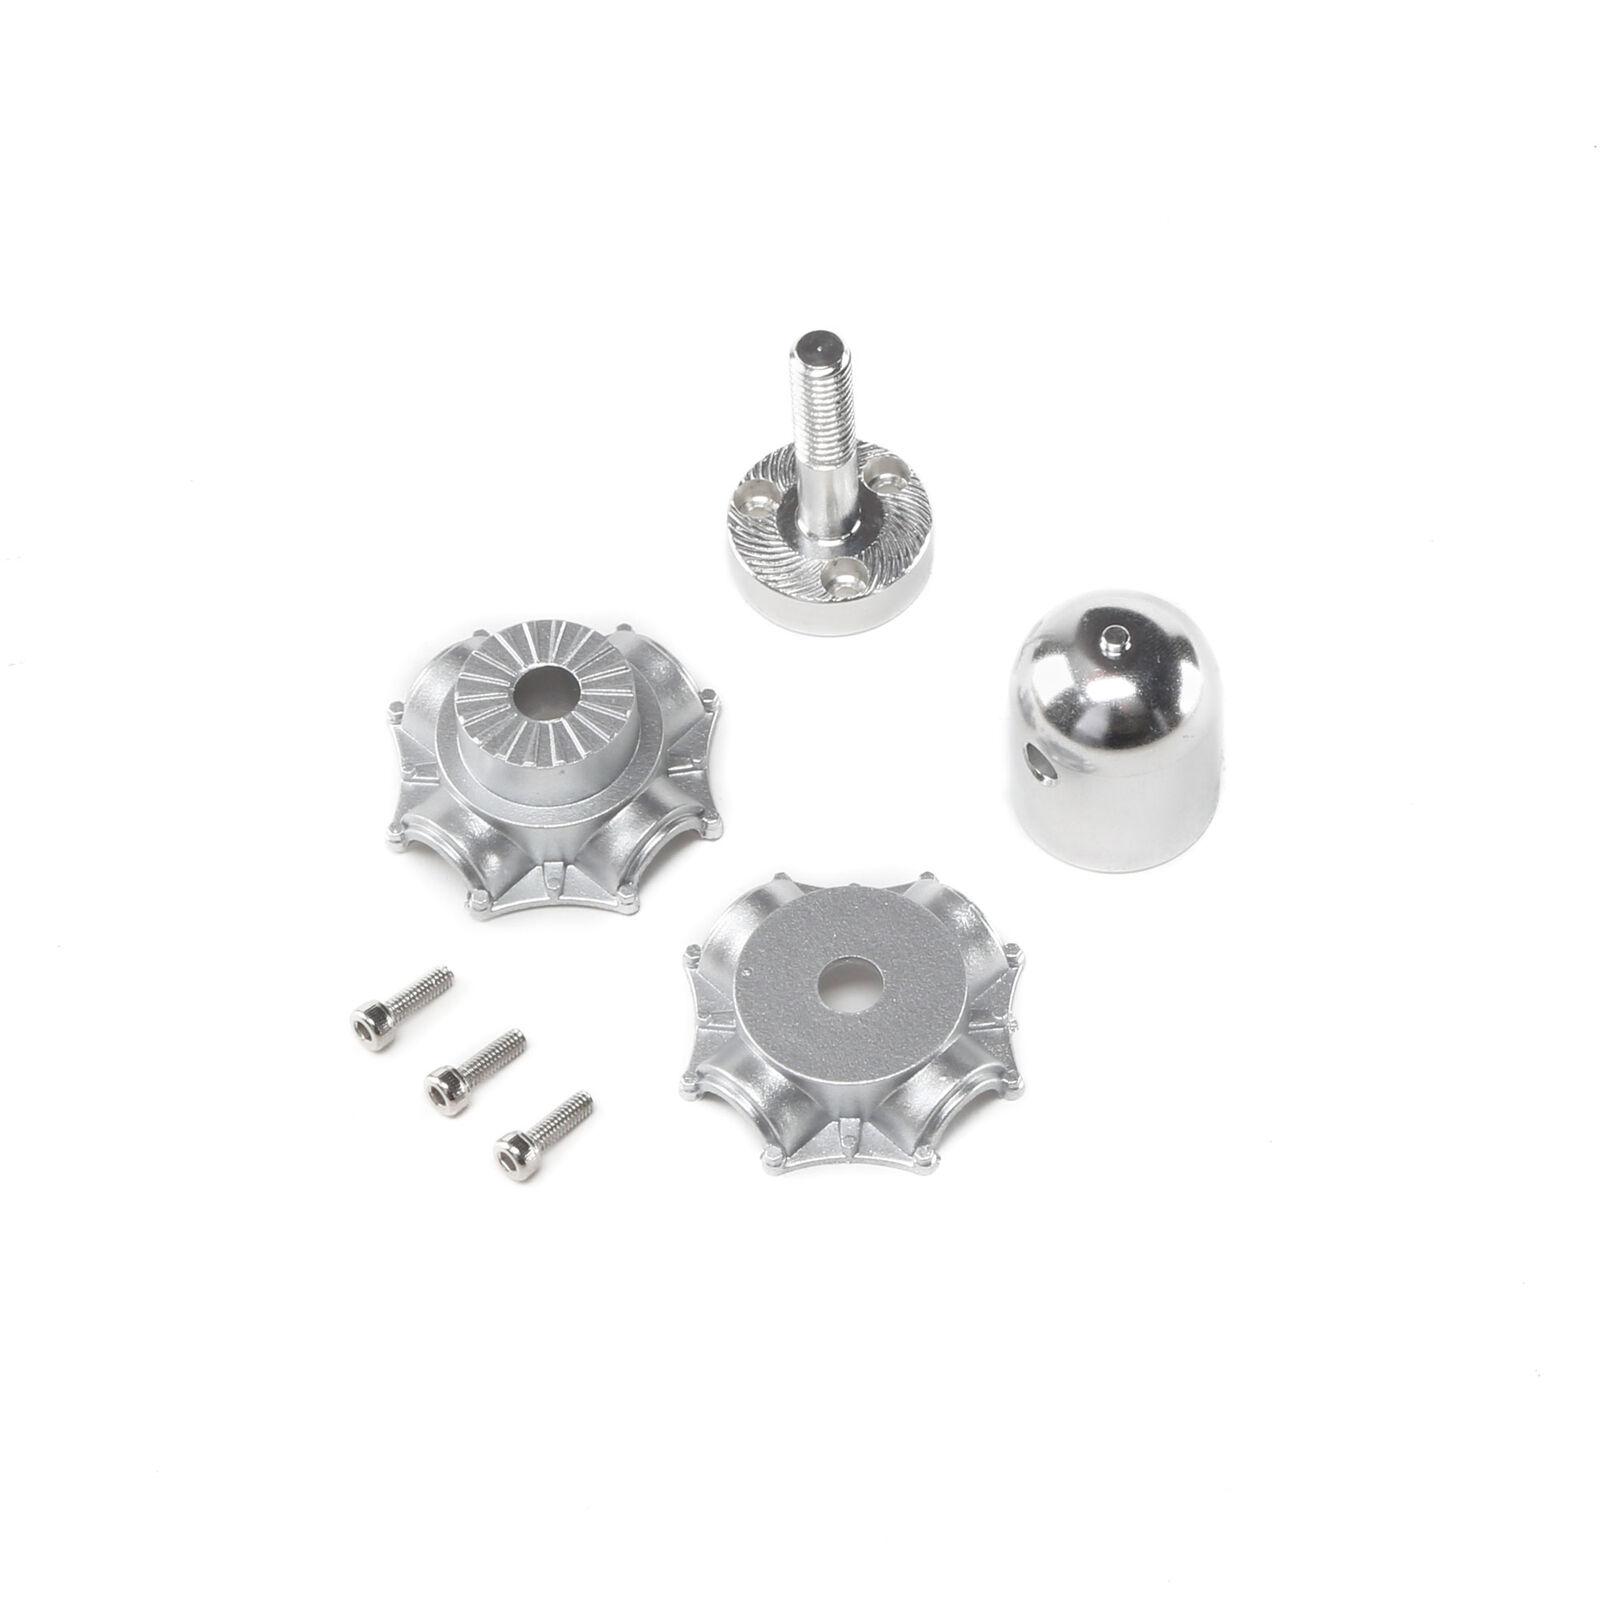 Prop Adapter, Aluminm Spinner, Plastic Hub: P-47 1.2m